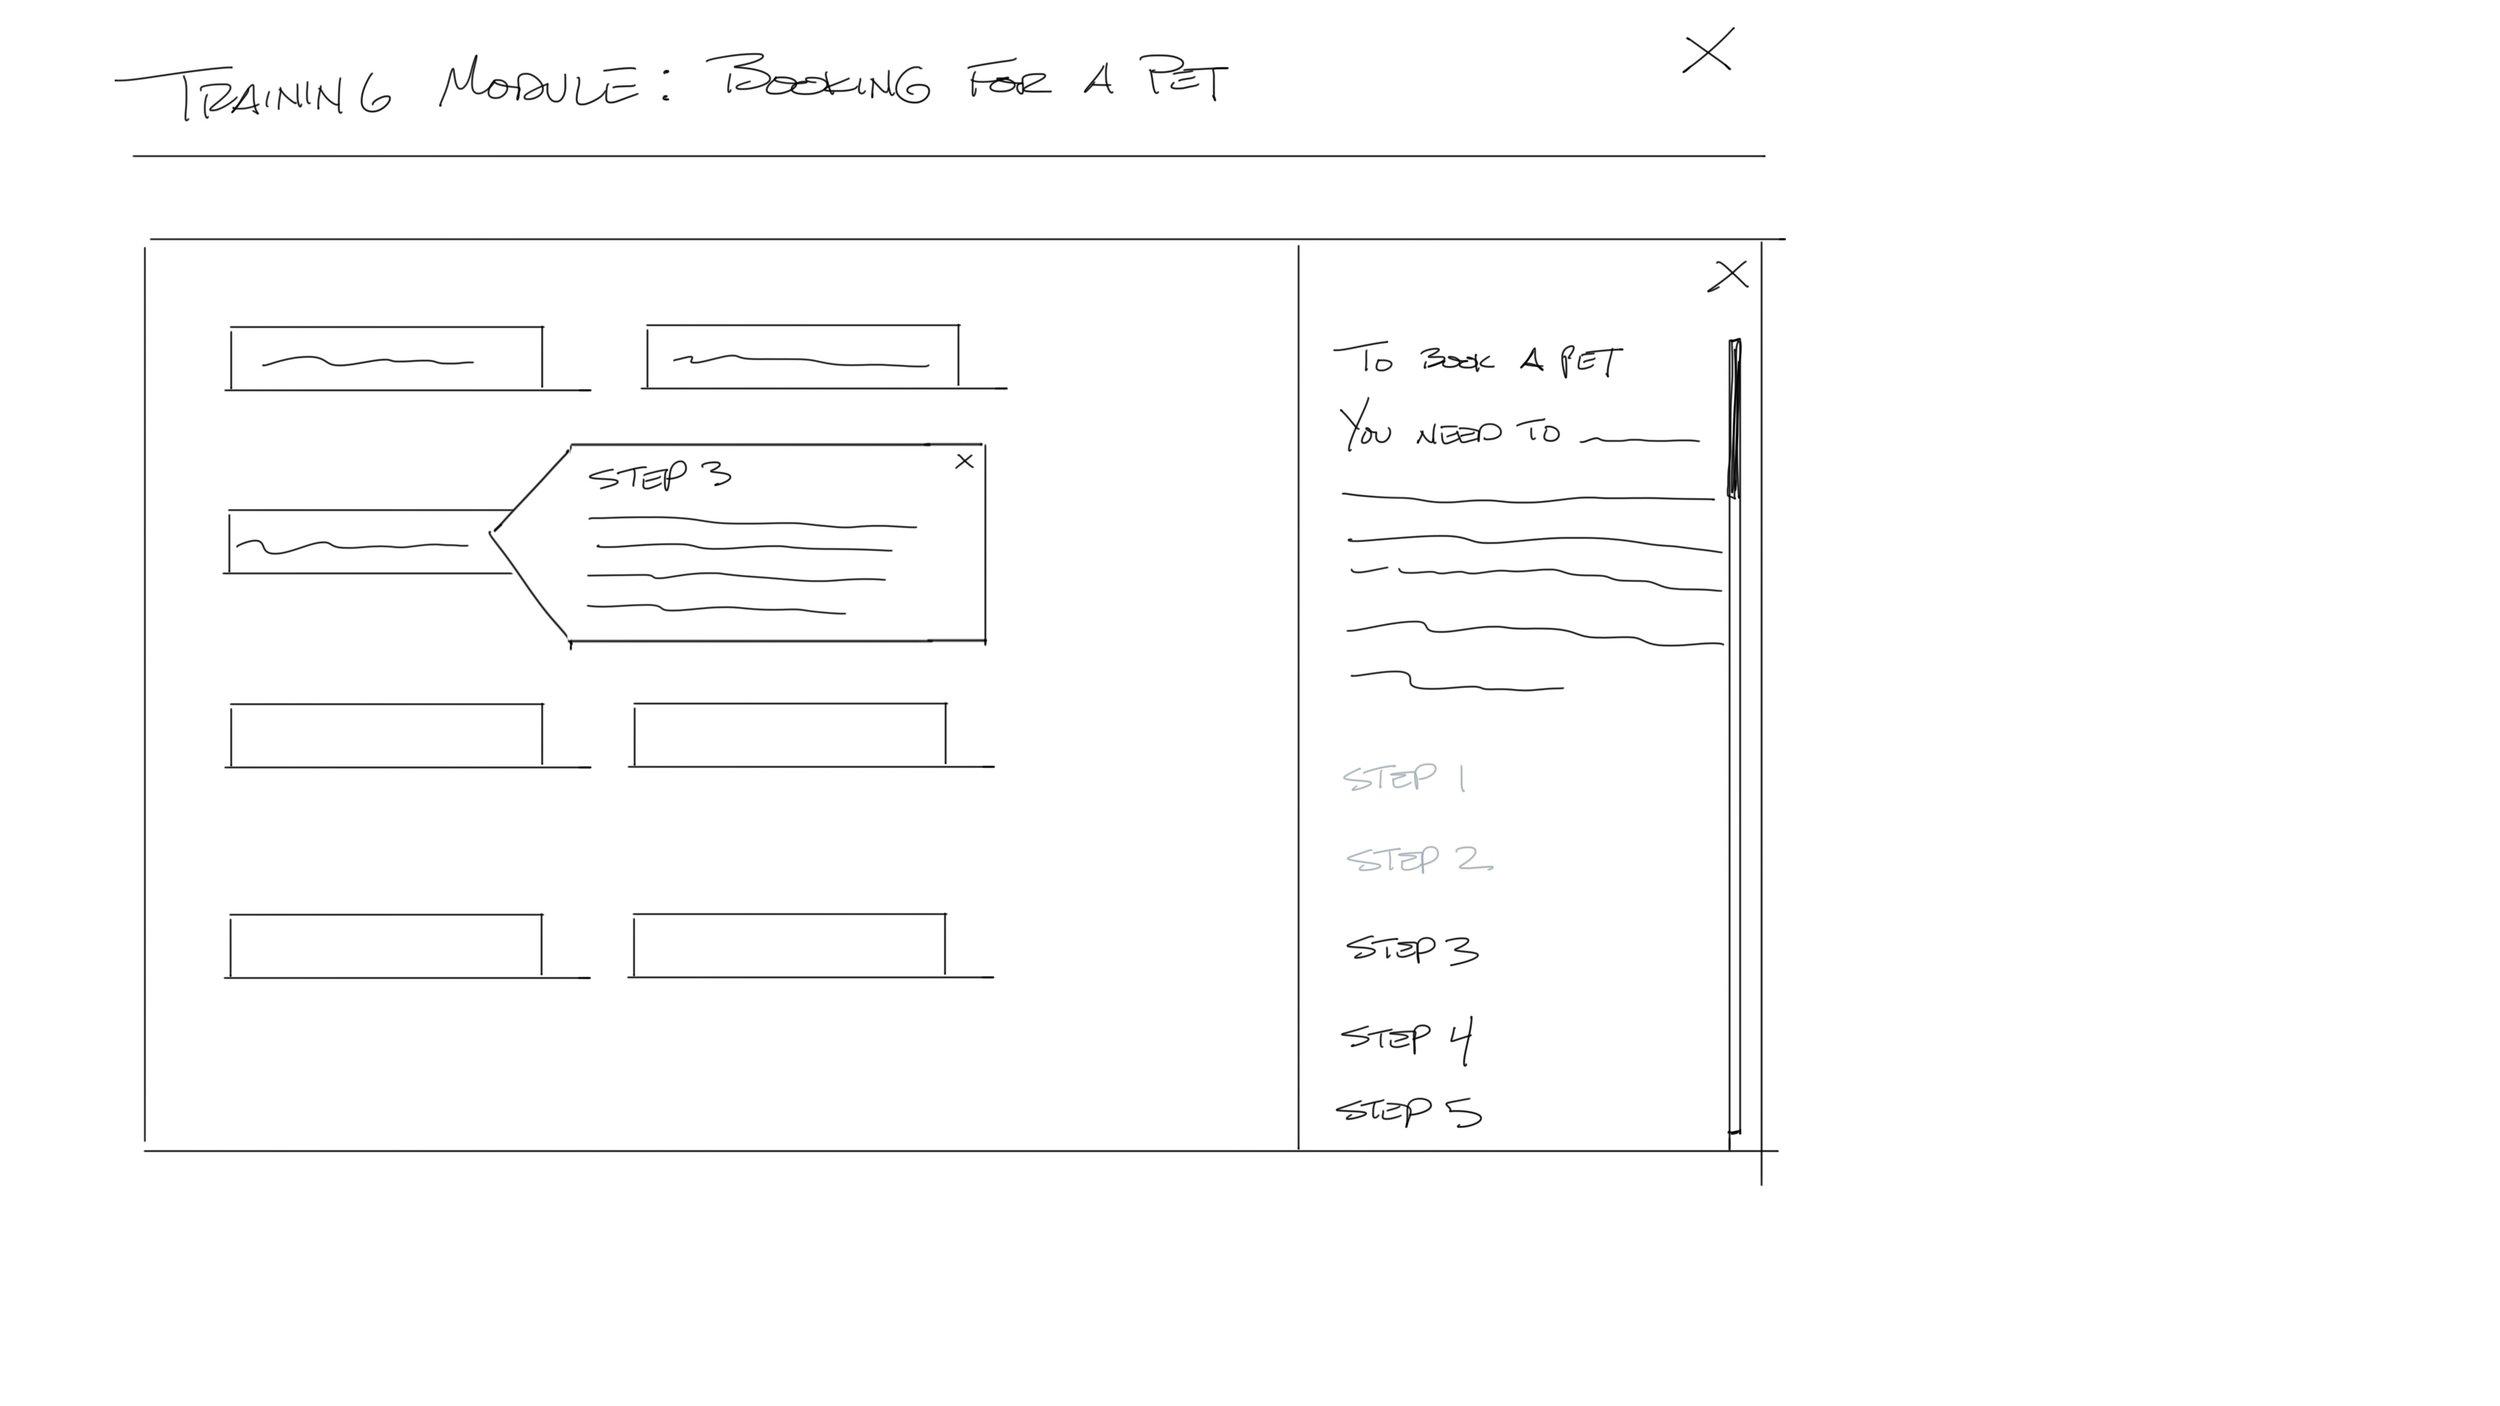 Training+Modules+Sketch+02.jpg